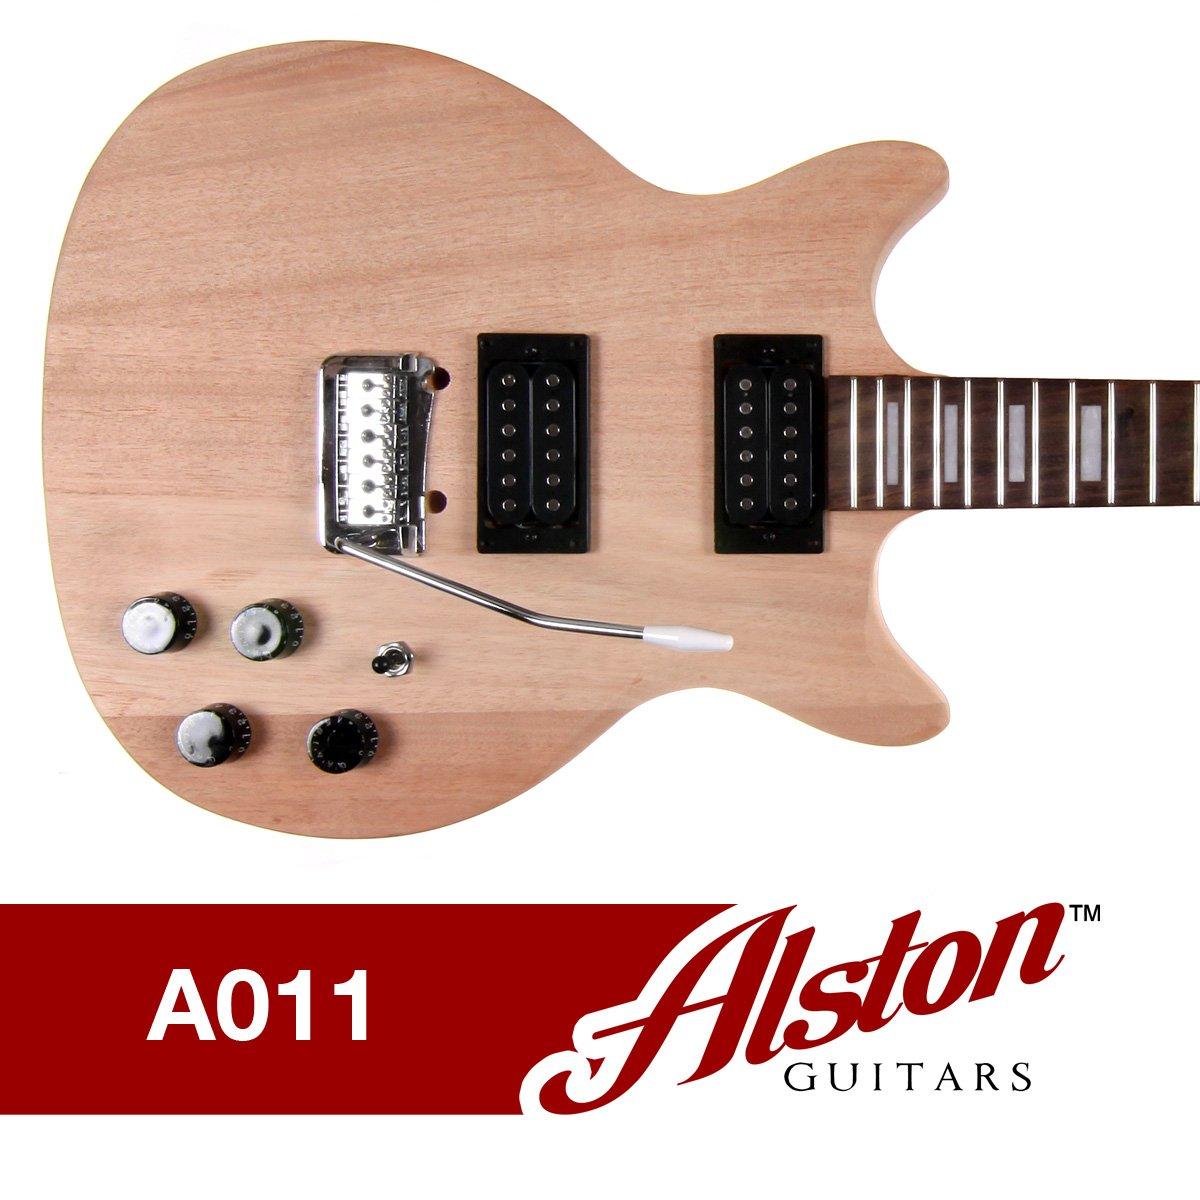 Alston Guitars Diy Electric Guitar Kit Bolt On Fine Custom Handmade Basses Parts Neck Solid Mahogany Maple A011 Musical Instruments